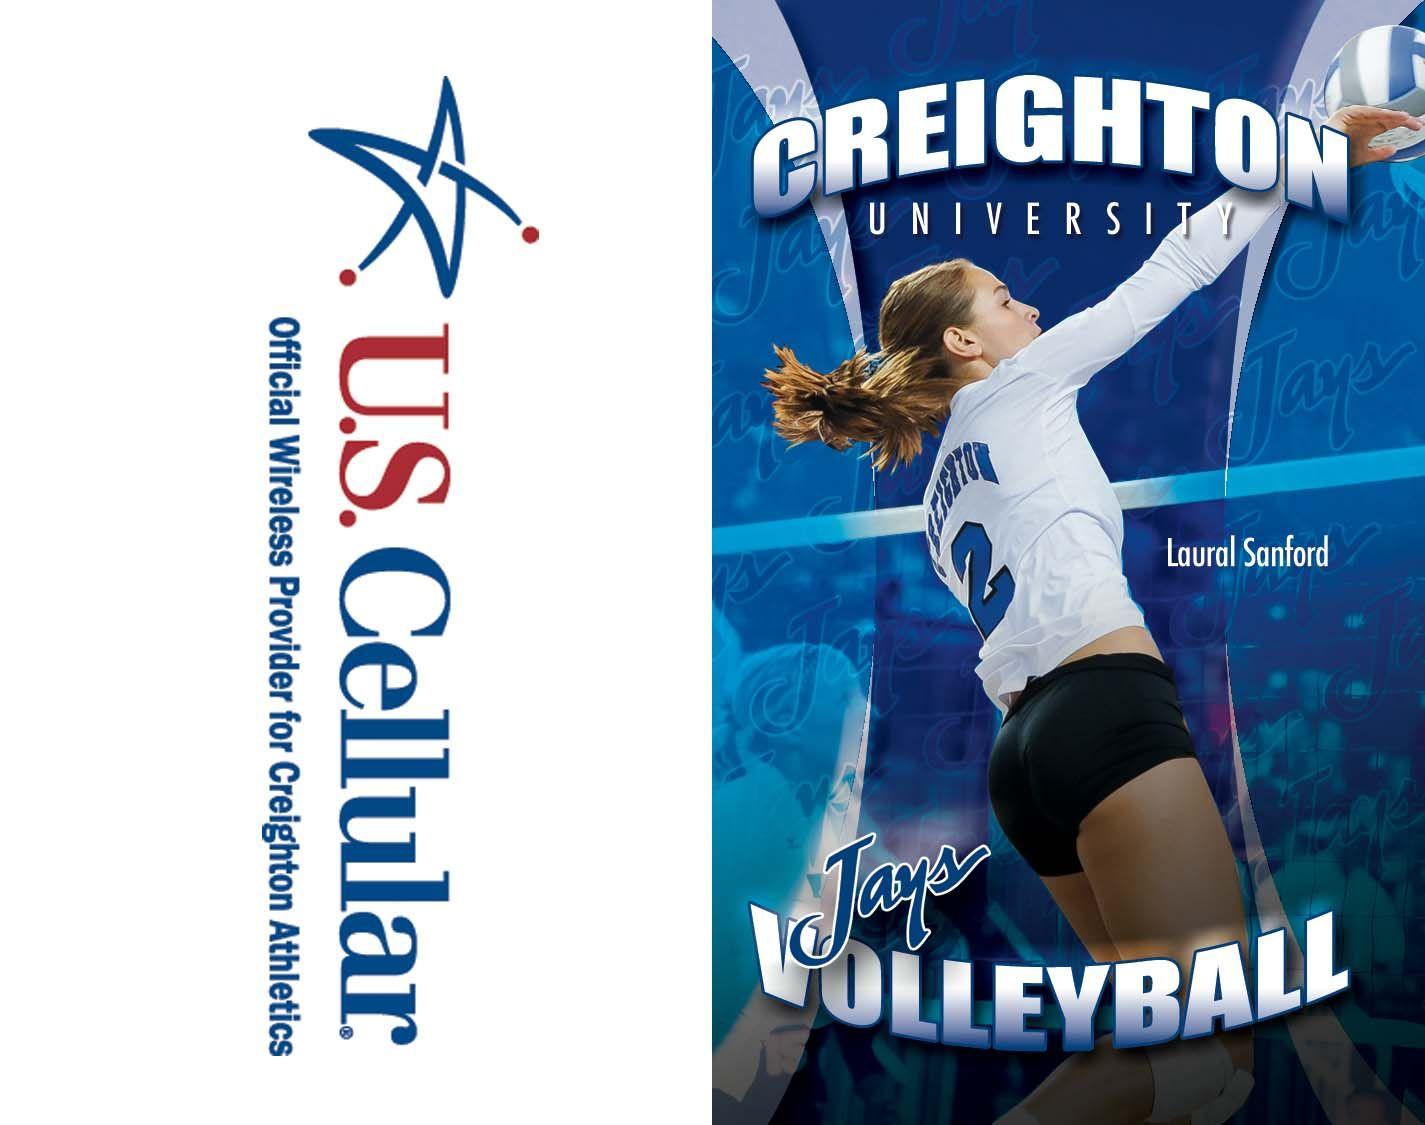 Creighton Volleyball College Sports Creighton Sports